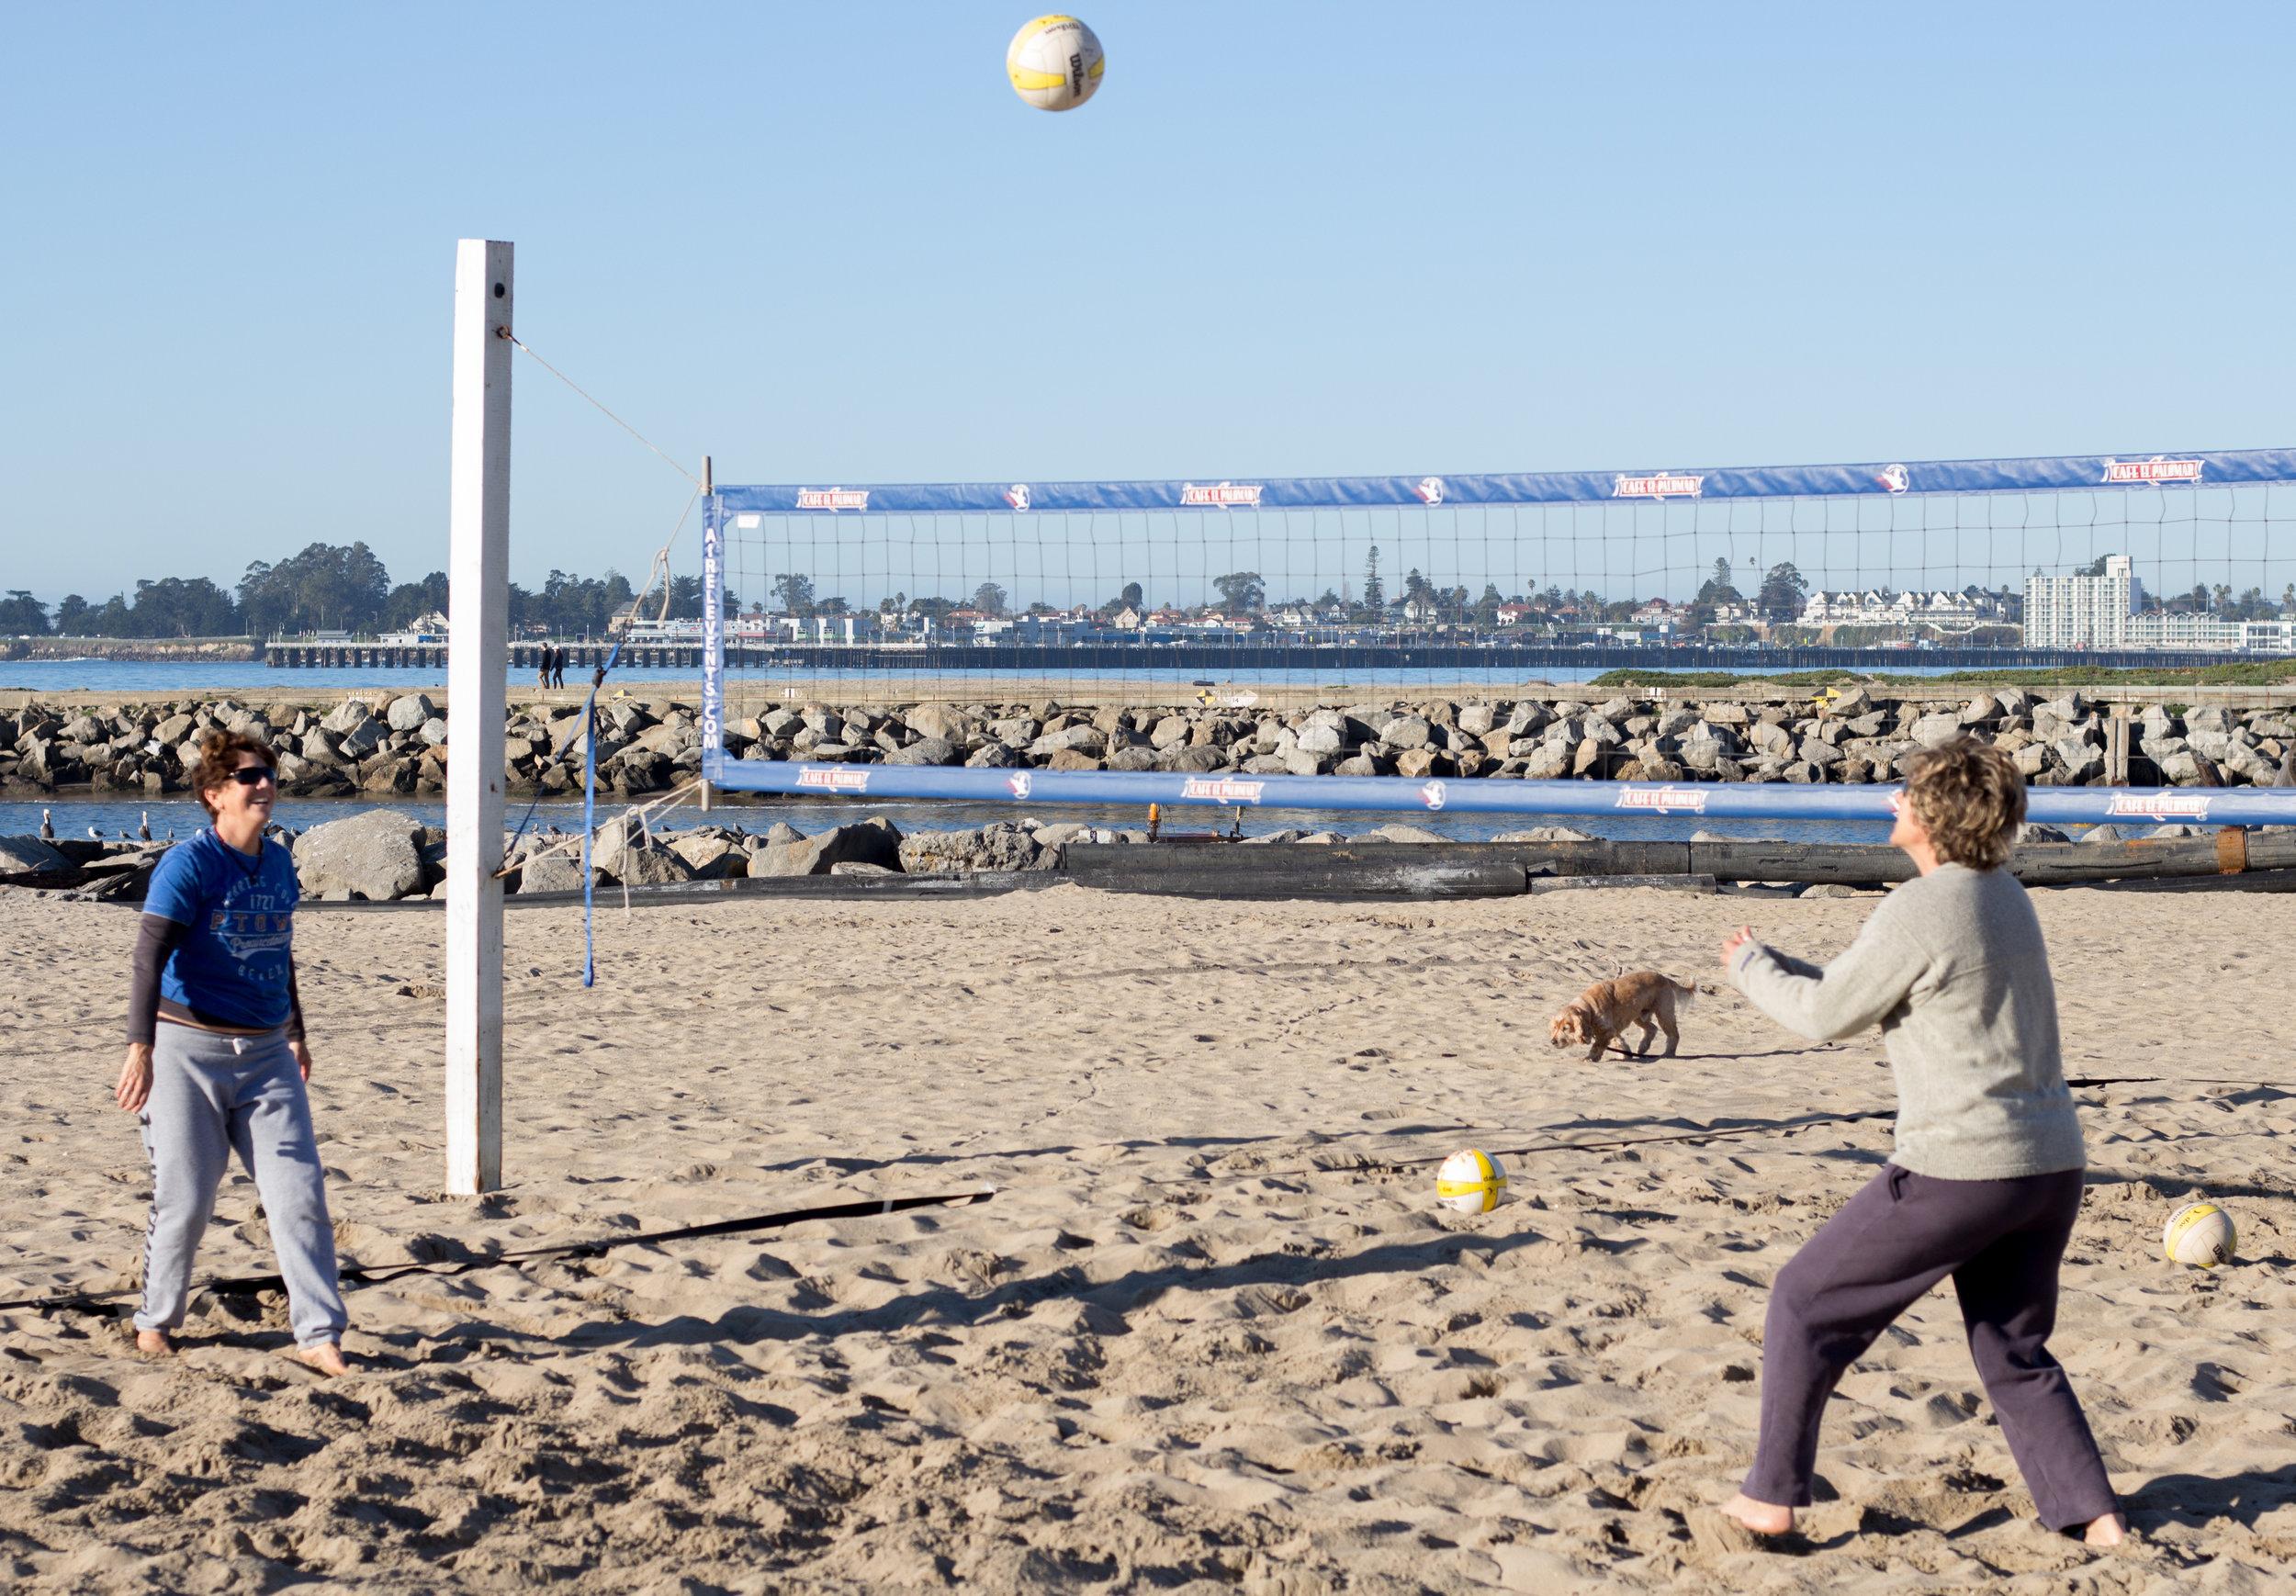 beach vball-11.jpg